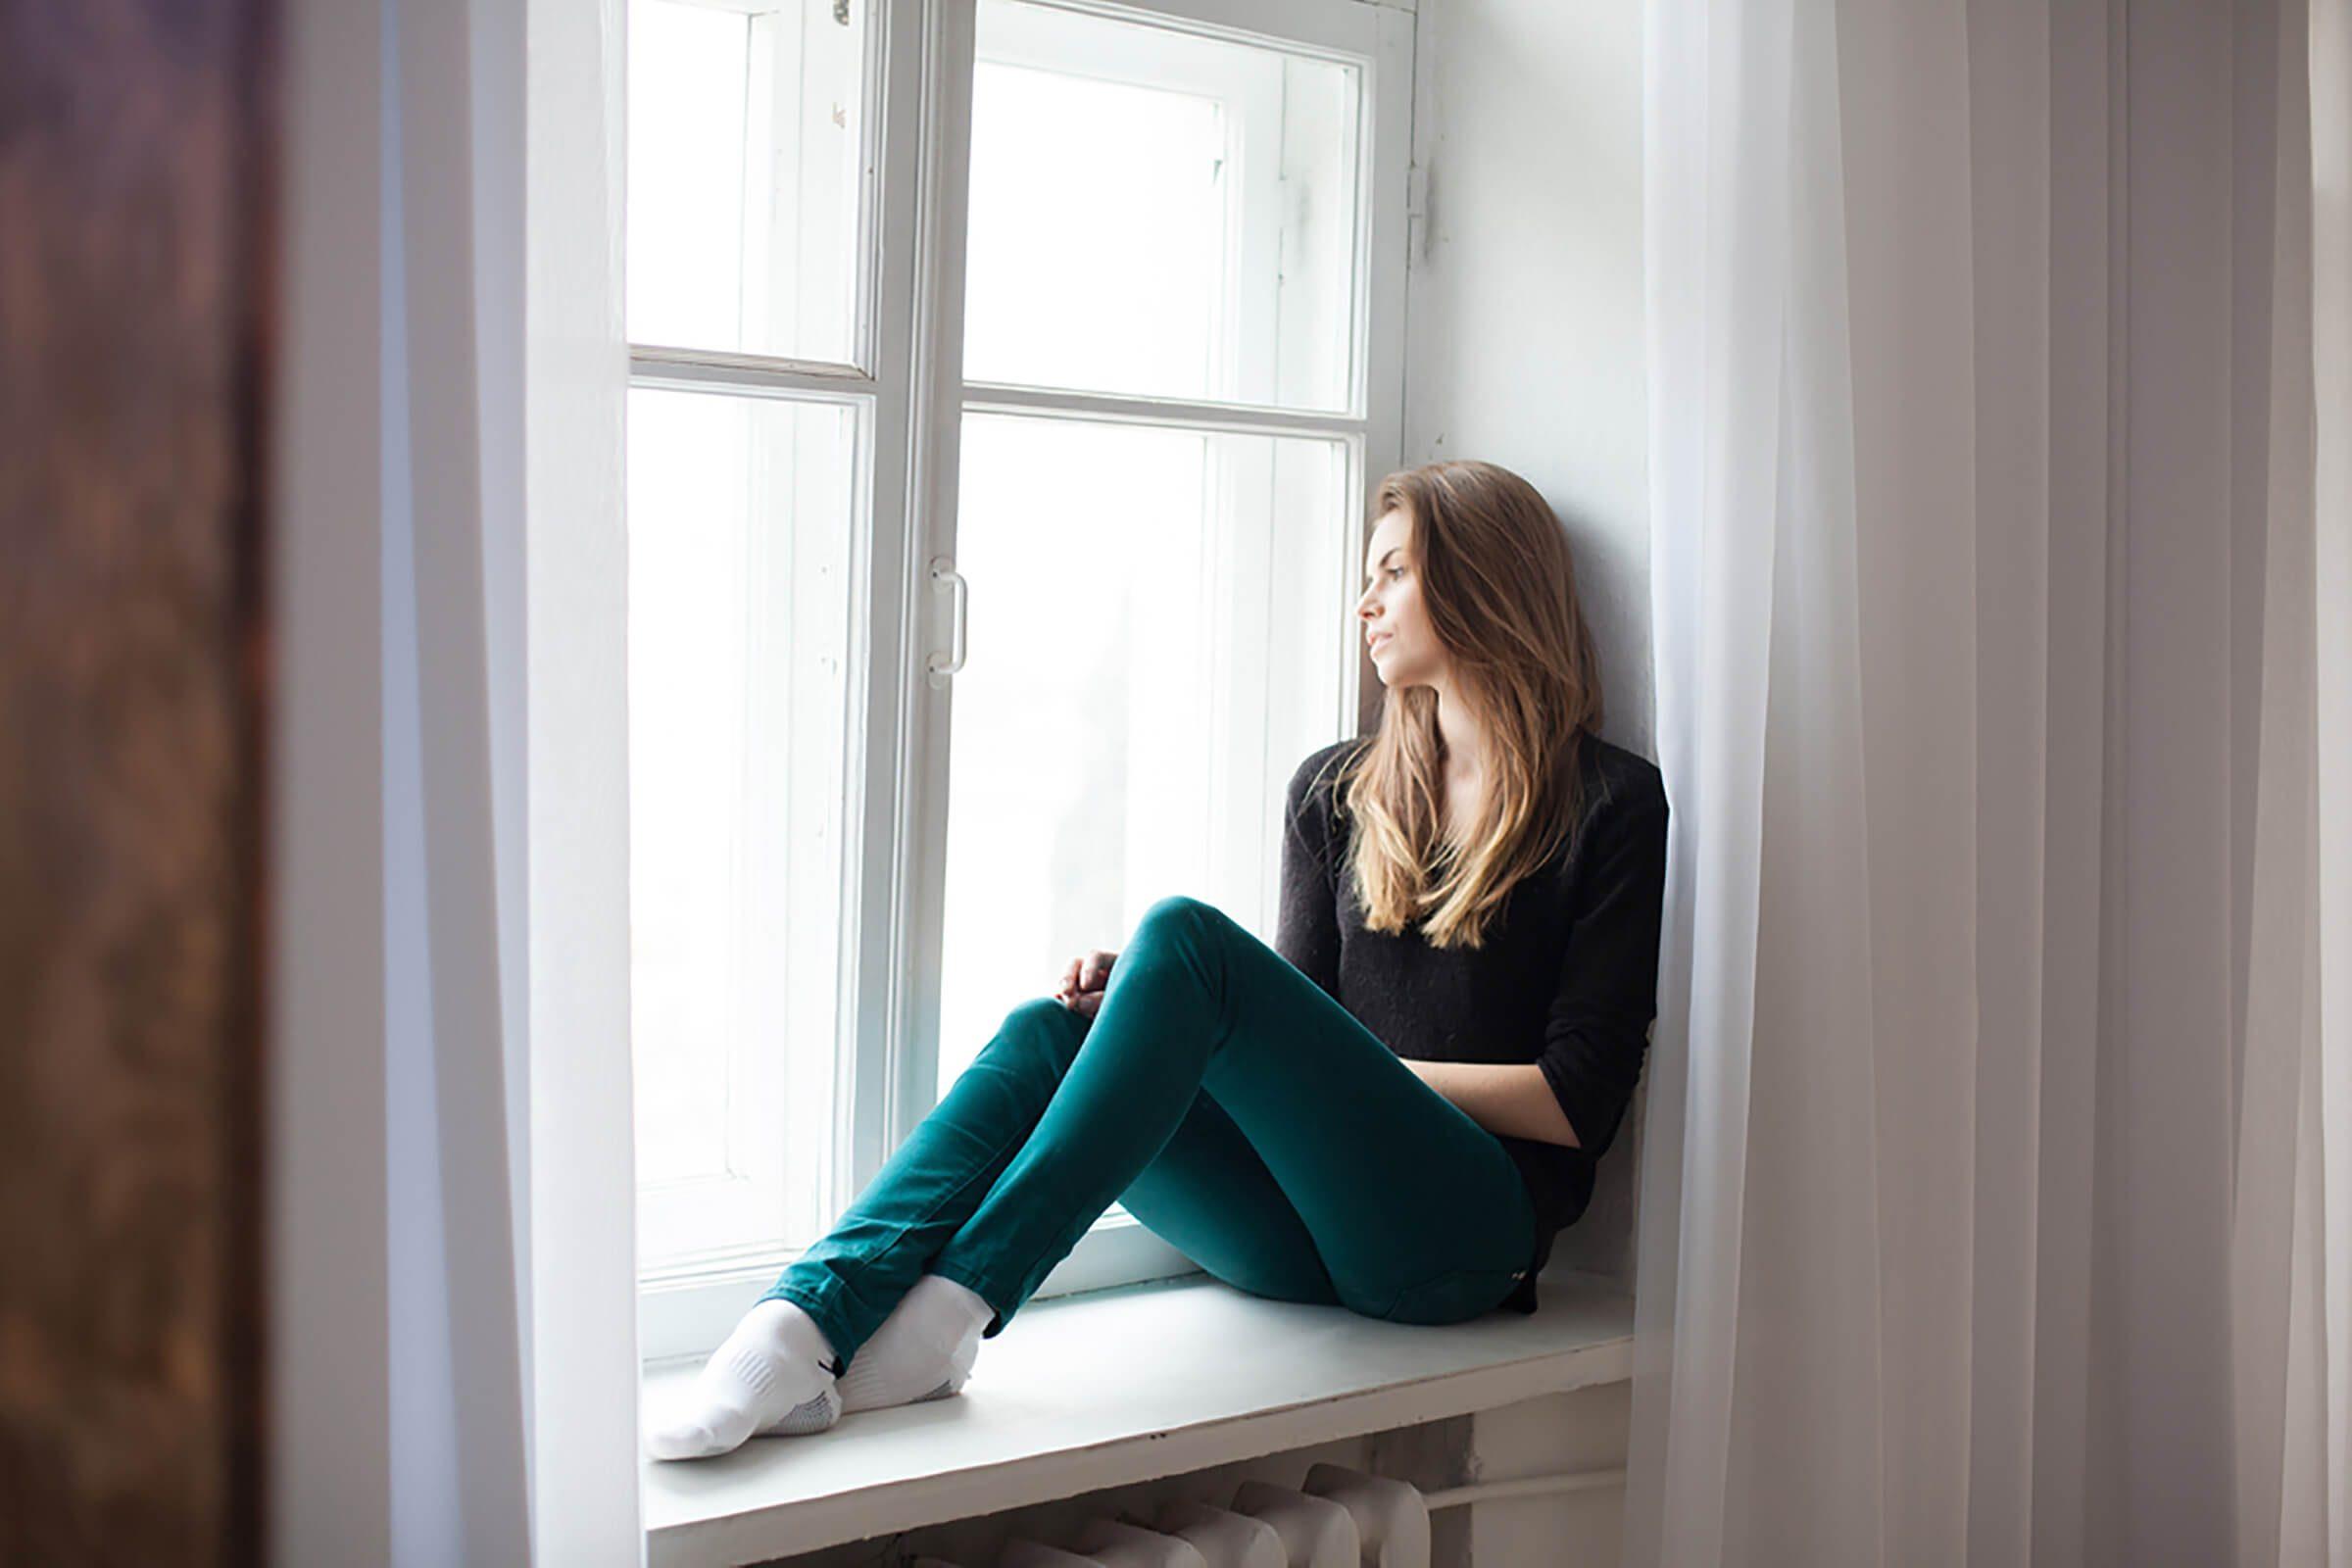 sad woman sitting on window ledge